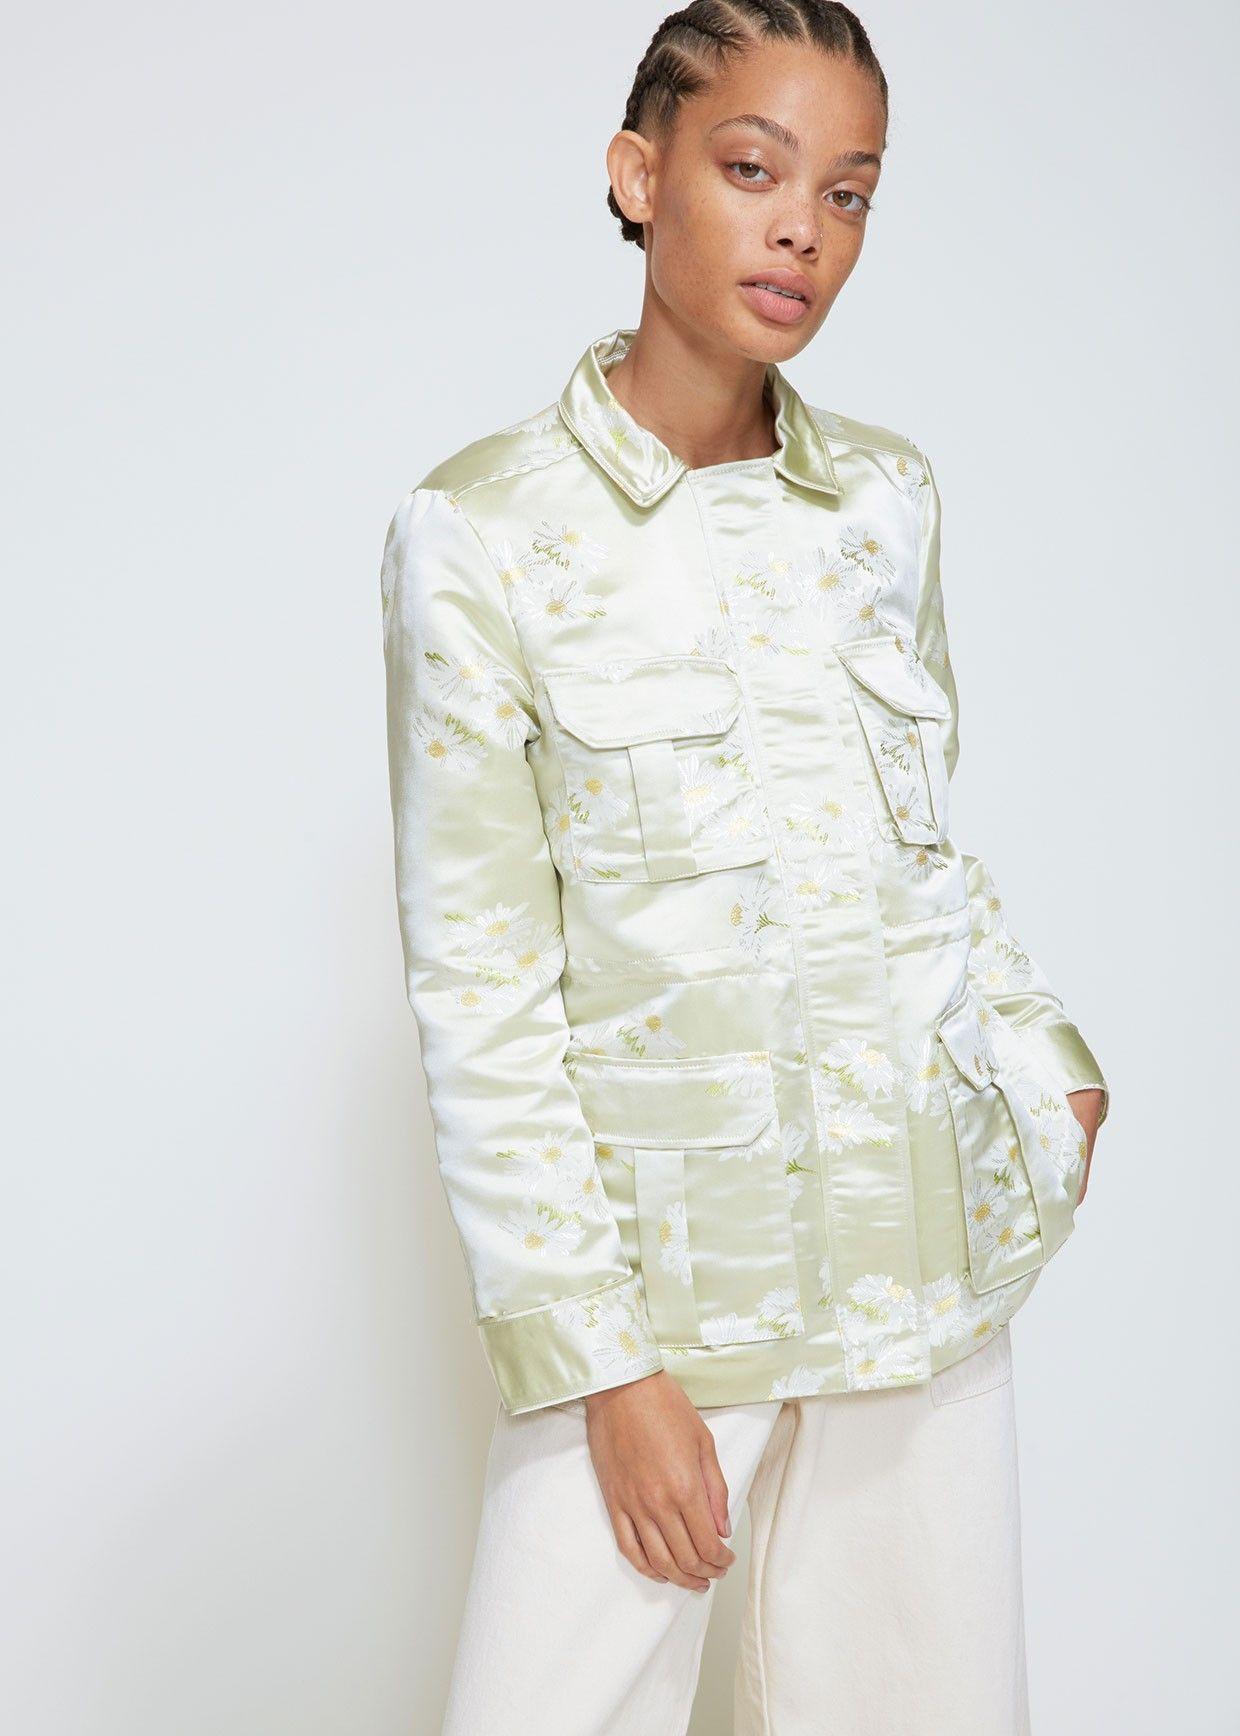 bd7a6369c9cc Totokaelo Senna Jacquard Jacket - Ganni - Designers - Womens